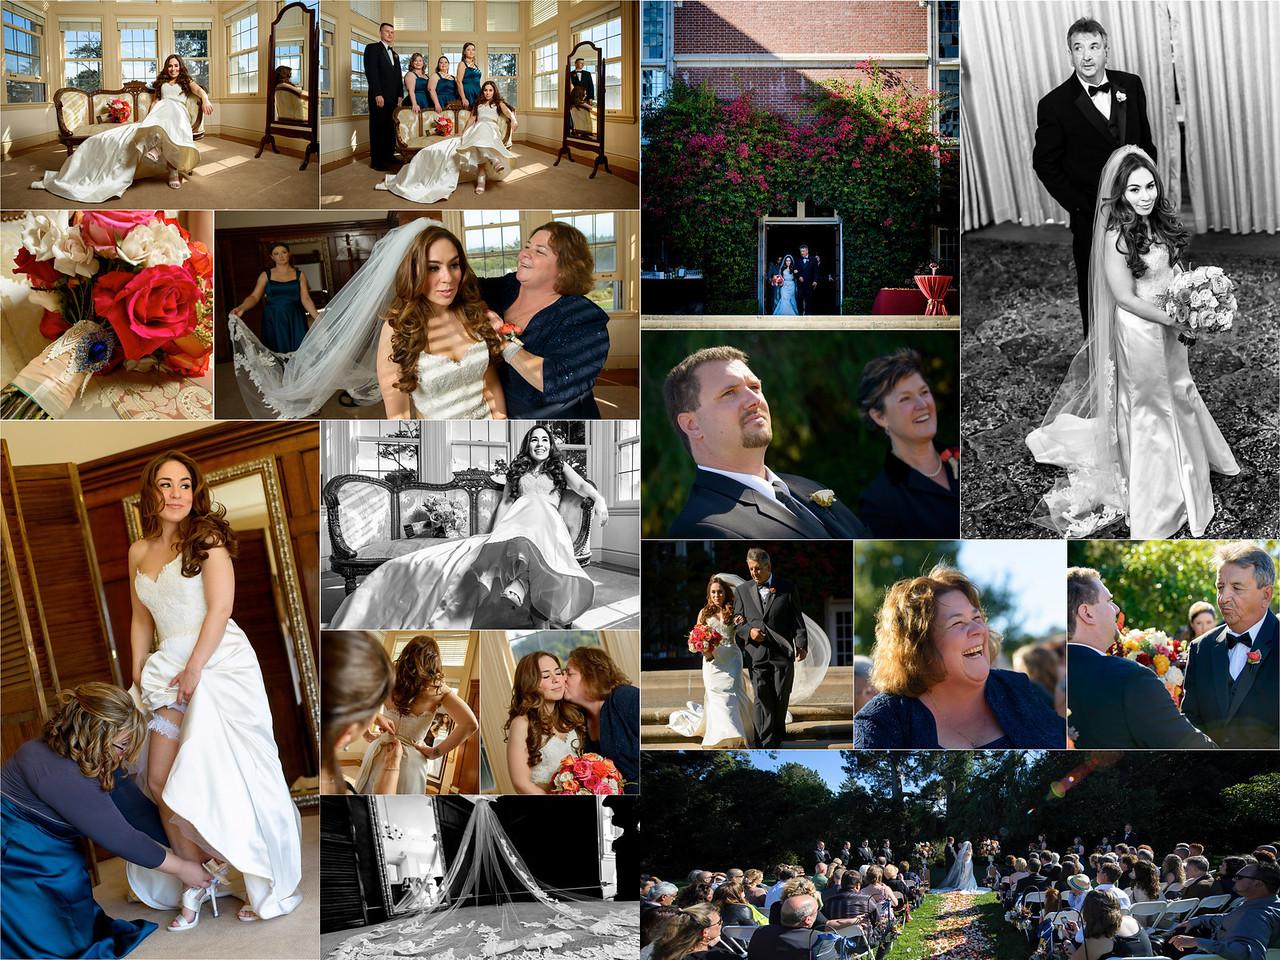 Danielle_and_Tony_Wedding_Photography_4x6_Photo_Board_02